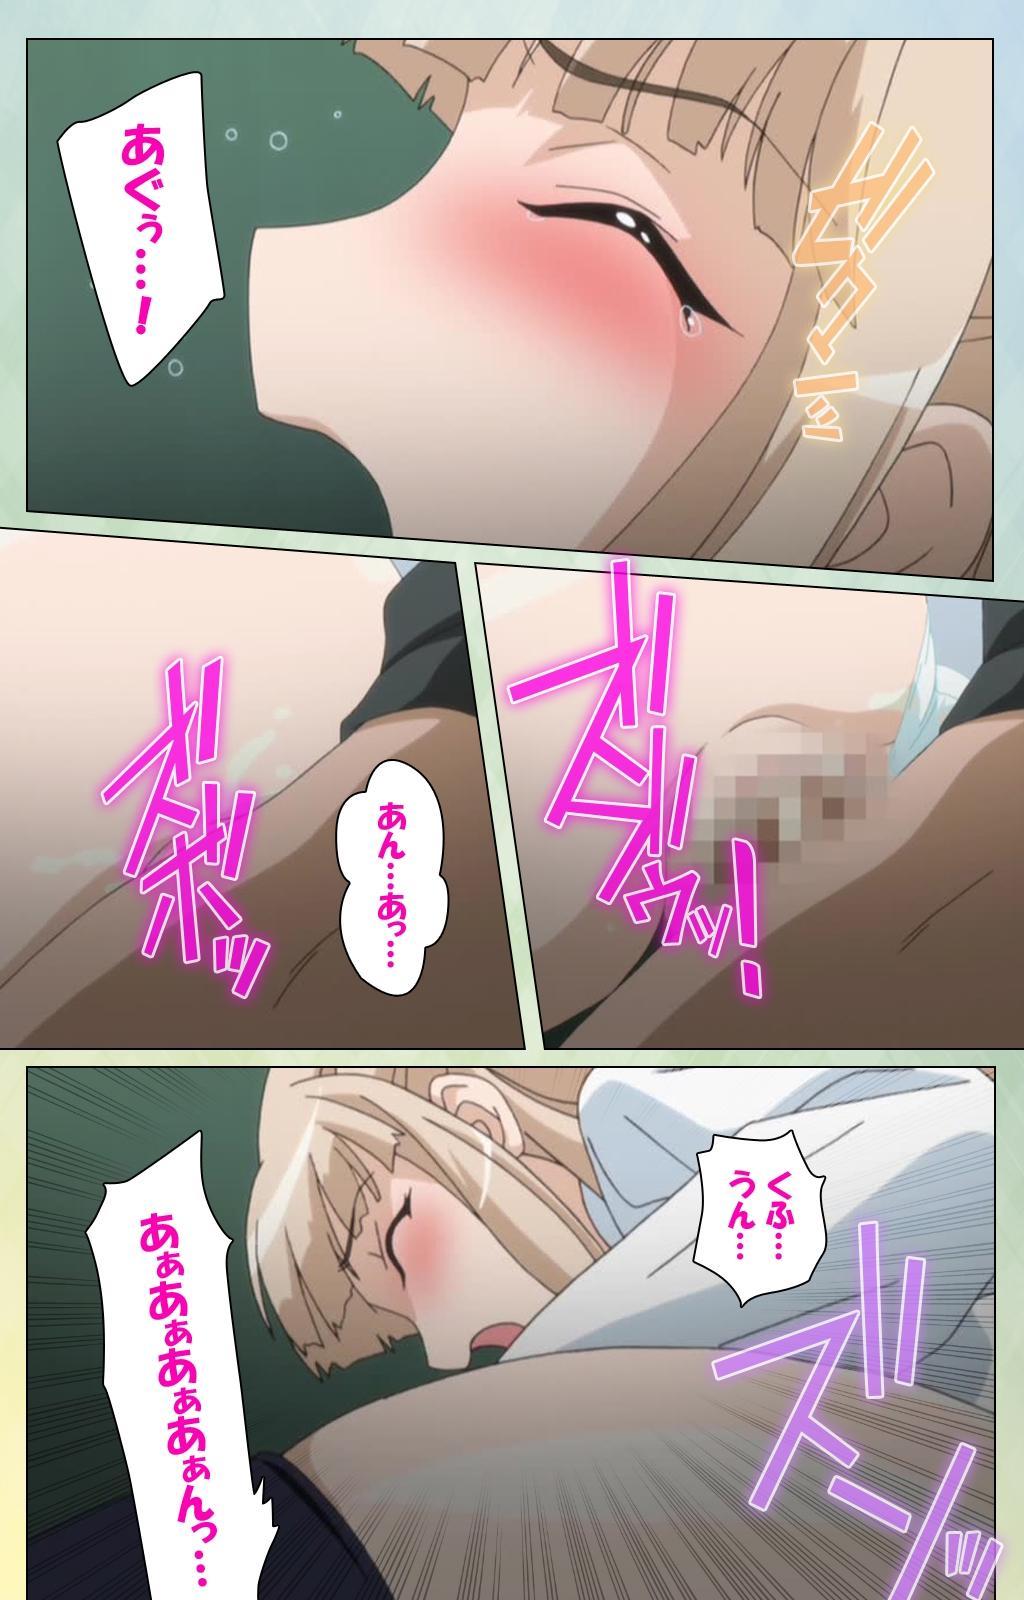 Furueru Kuchibiru fuzzy lips1 Complete Ban 6